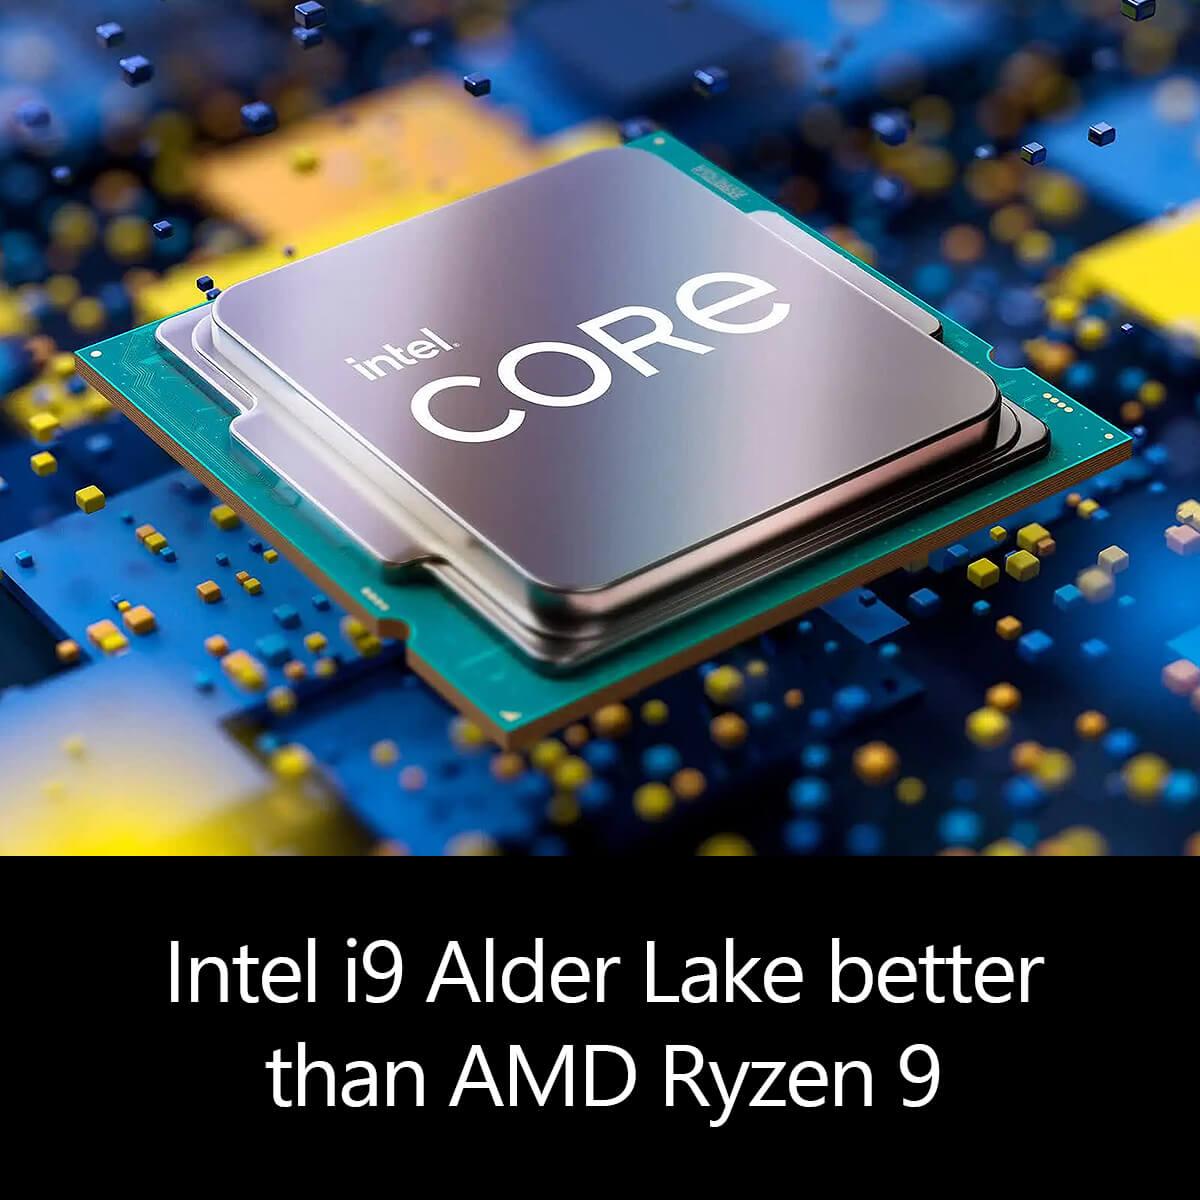 Intel i9 Alder Lake better than AMD Ryzen 9